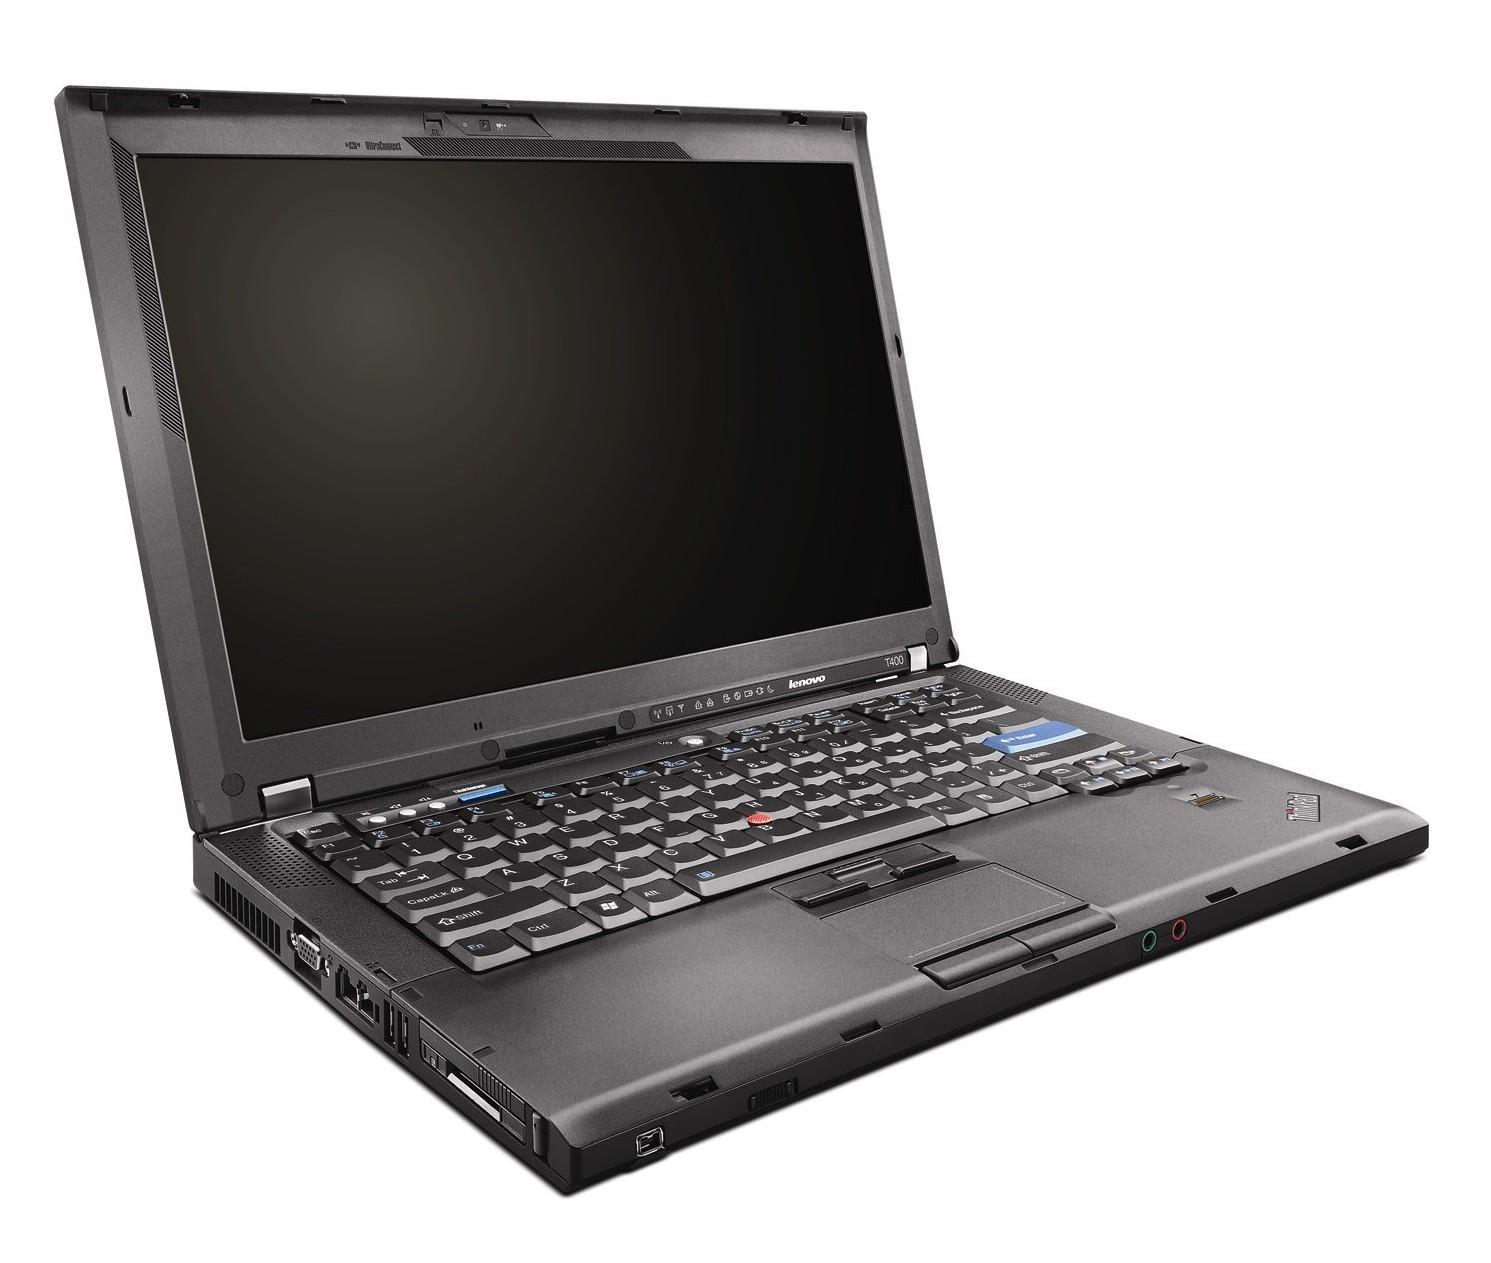 "PC Portable 14.1"" Lenovo Thinkpad T400 - 1280 x 800, Core 2 Duo P8400 2.26GHz, RAM 4Go, 160Go, Windows 7 Edition Familiale (Reconditionné)"